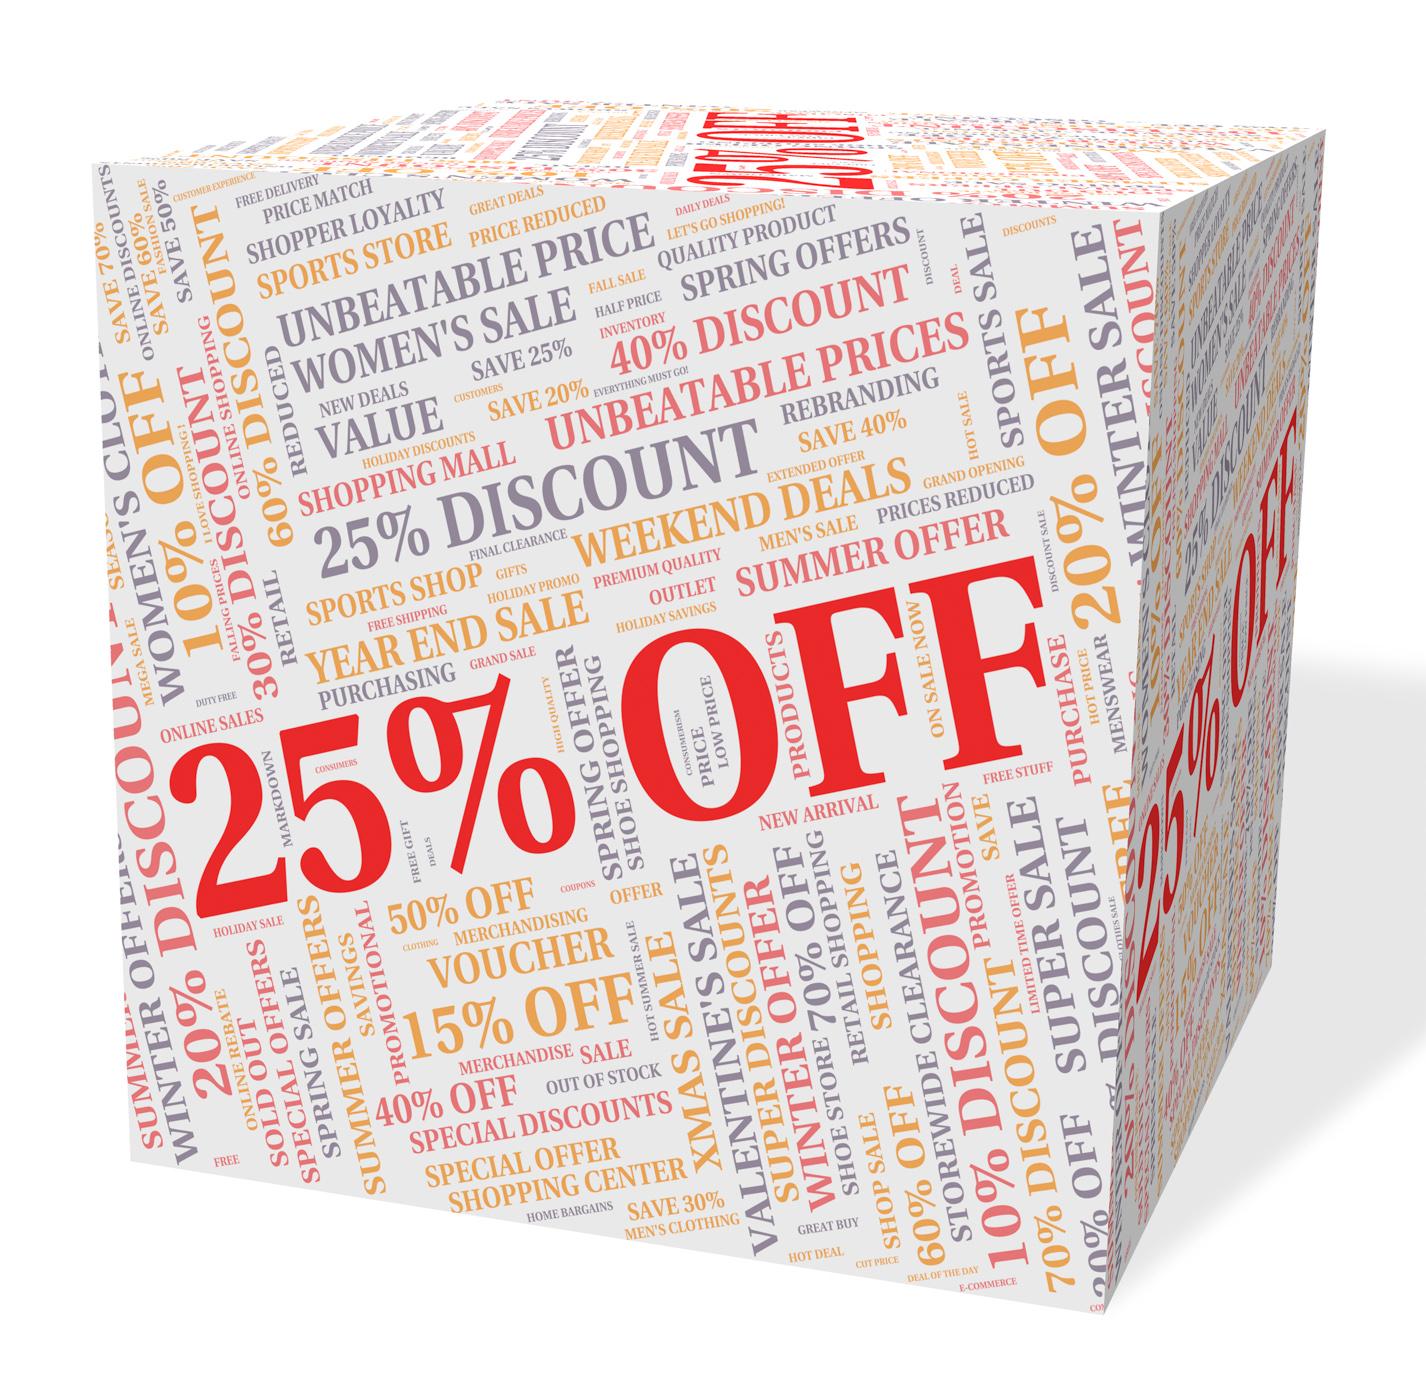 Twenty five percent indicates bargain save and word photo